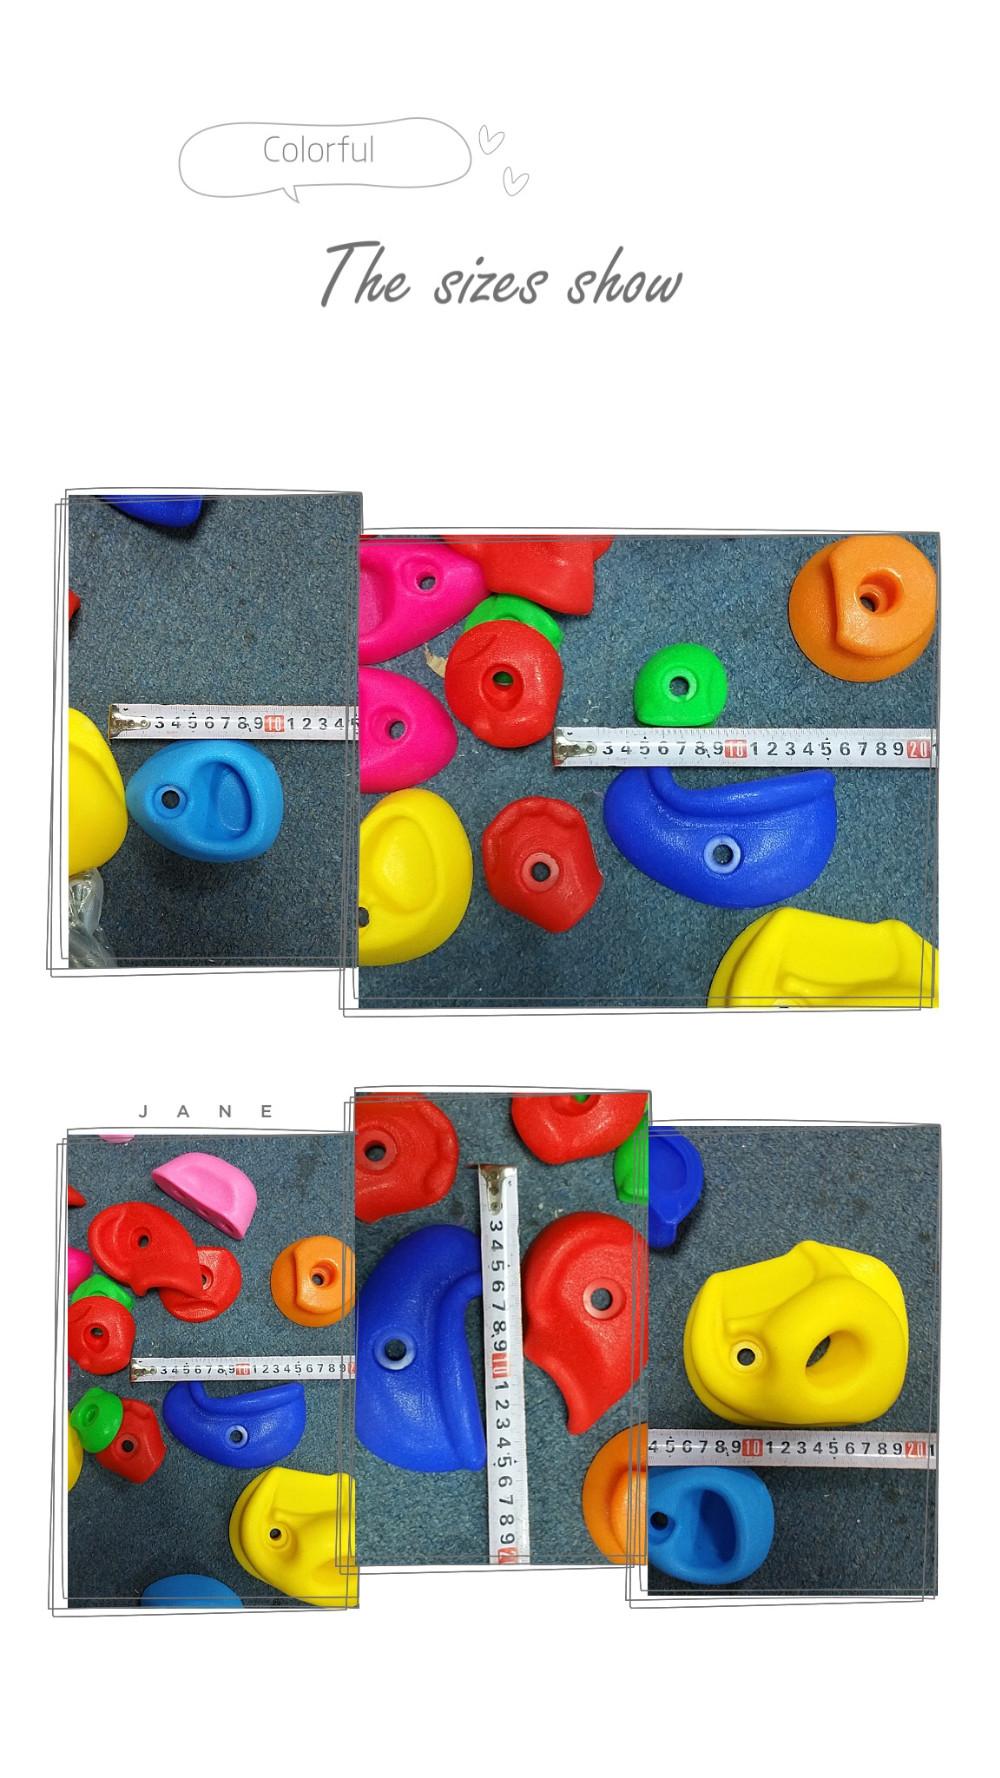 HTB1Qo2HOFXXXXcCaXXXq6xXFXXXc - 16 to 32 PCS / SET Plastic children Rock Climbing Wall Rock Stones Kids Toys Sports tool outdoor game kindergarten Without scre